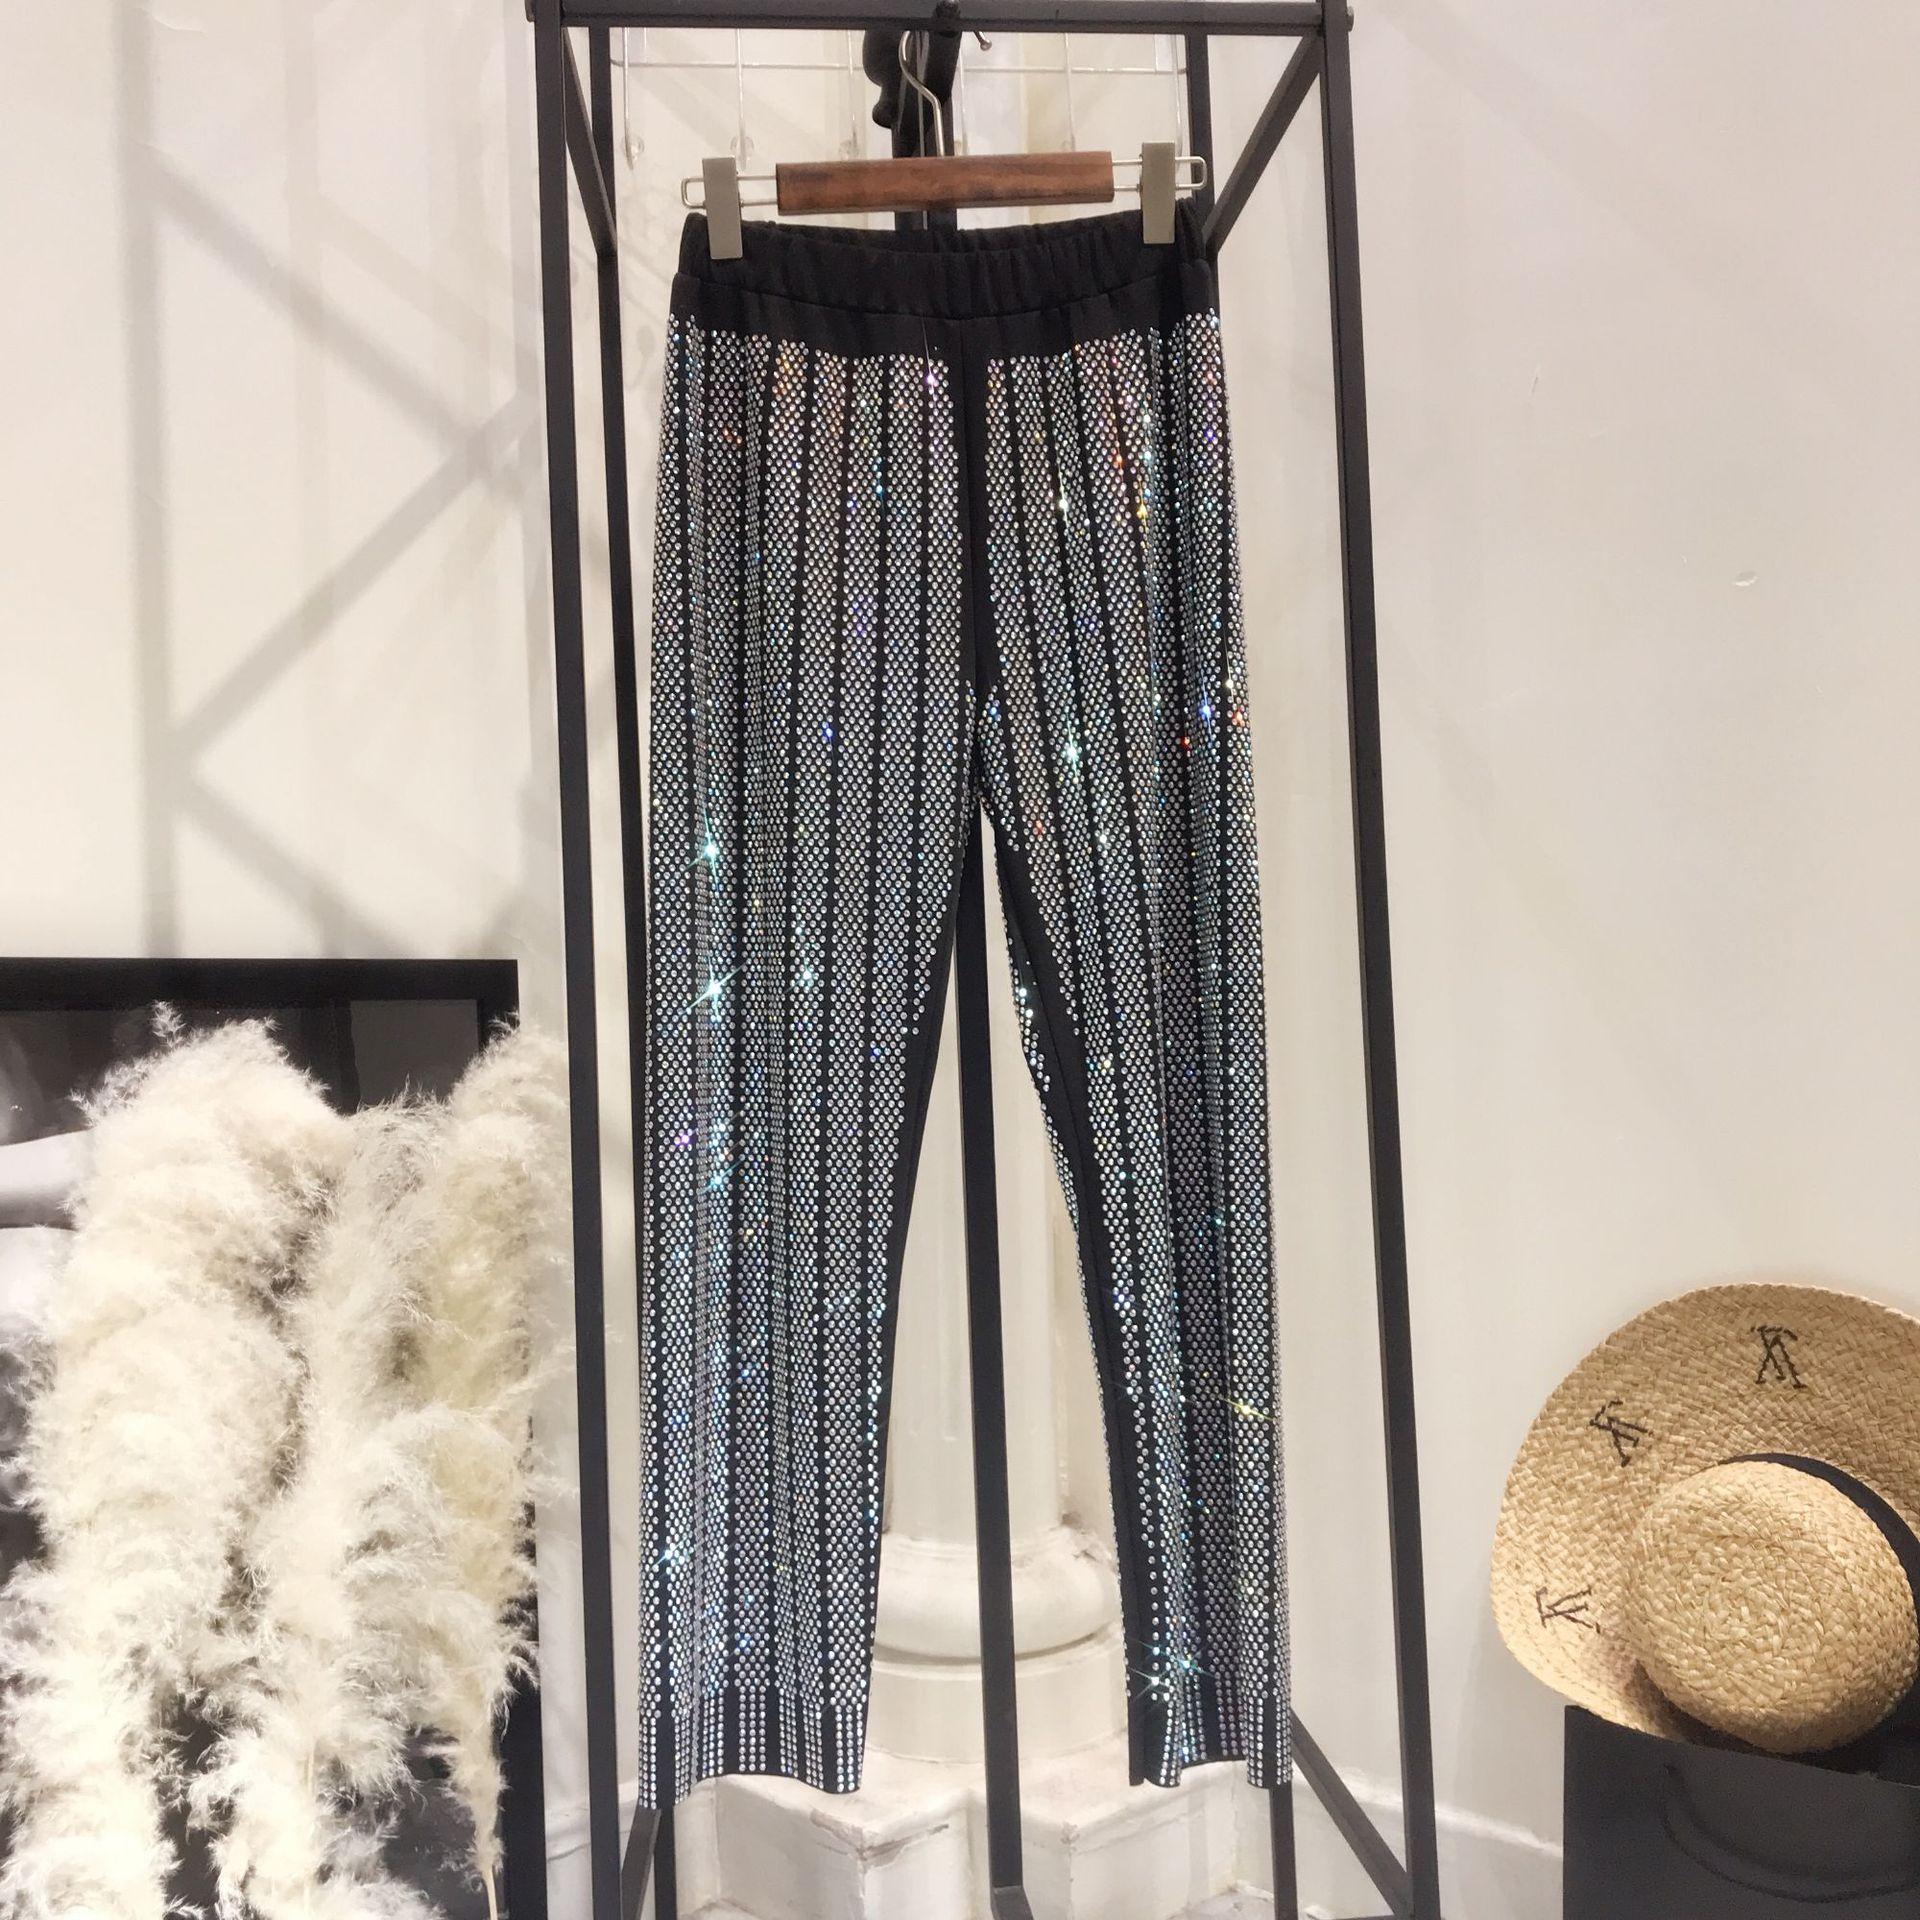 Lentejuelas Marca Cintura Completa De Black Calle Alta 2018 Longitud Pantalones Pierna Con Llamaradas Ancha Moda Bordadas wSqHzRI